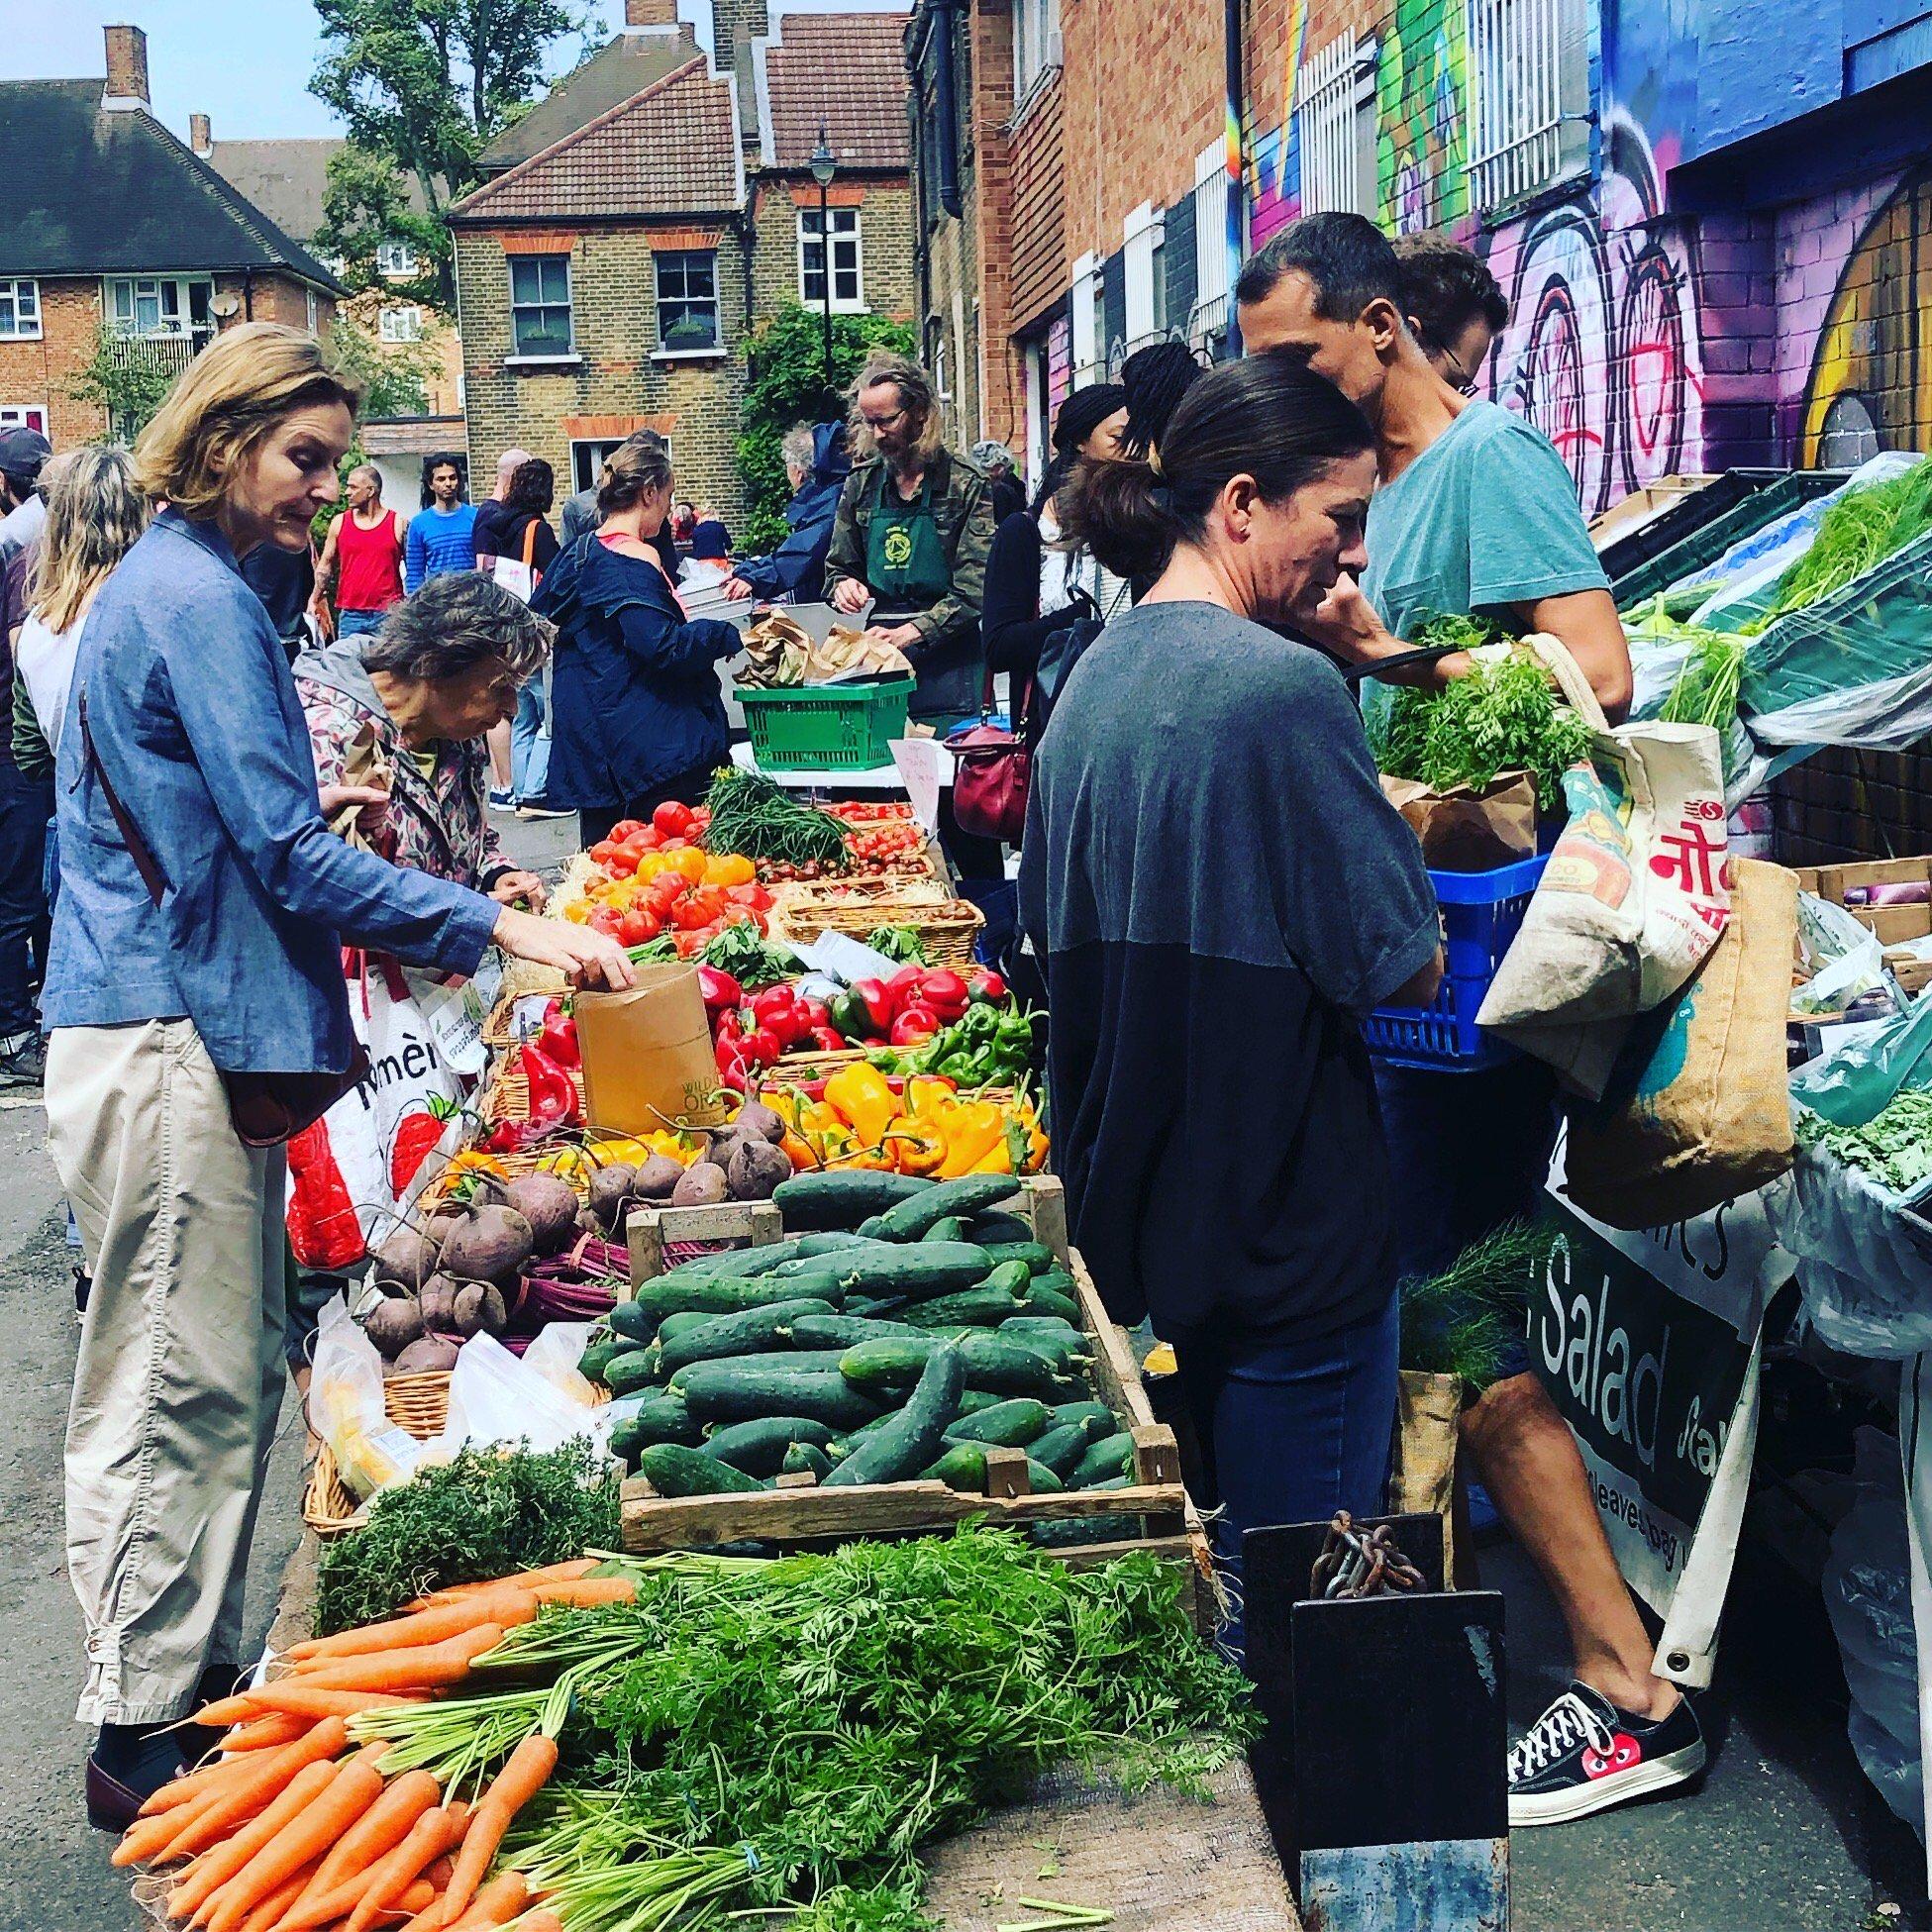 CP food market south london club